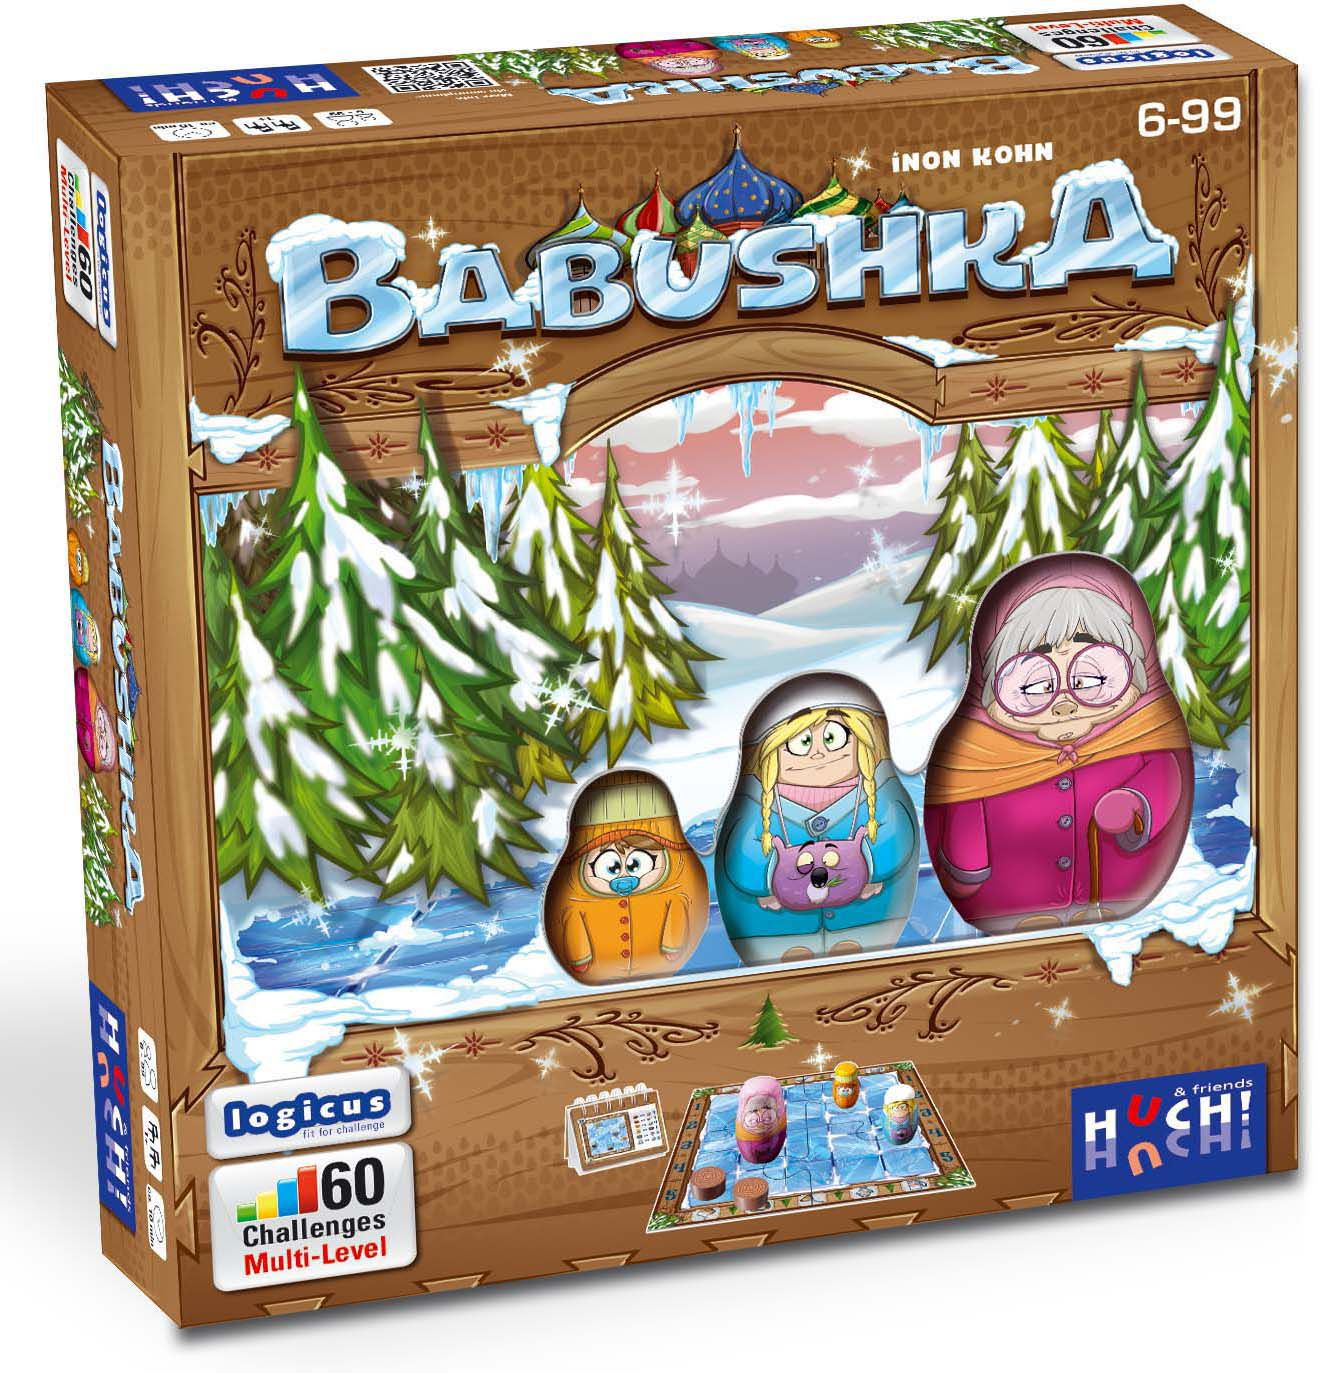 HUCH FRIENDS Huch! & friends Brettspiel, »Babushka«